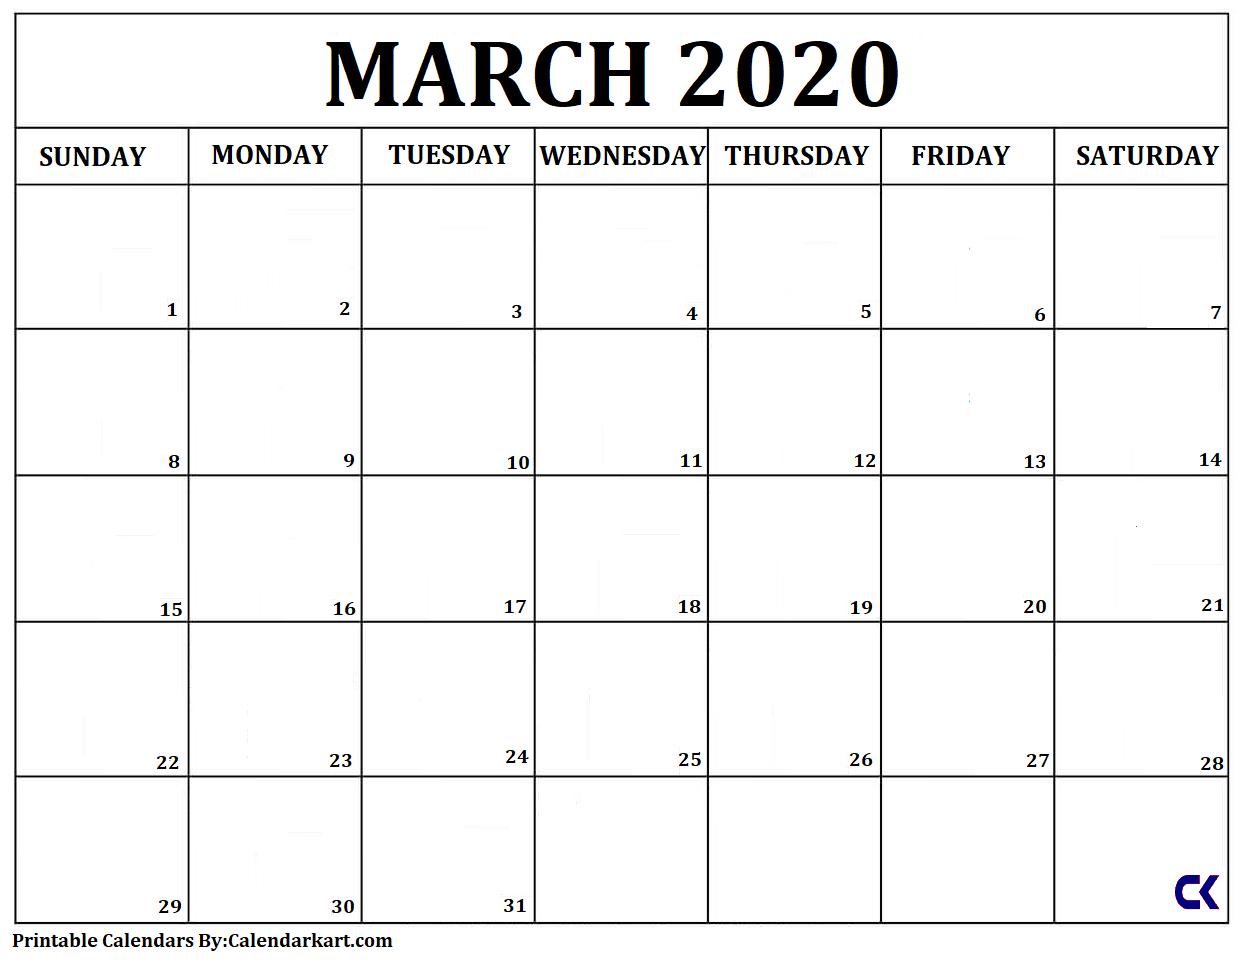 Free Printable Calendar Templates 2020 » Calendarkart Free No Download Printable Calendars